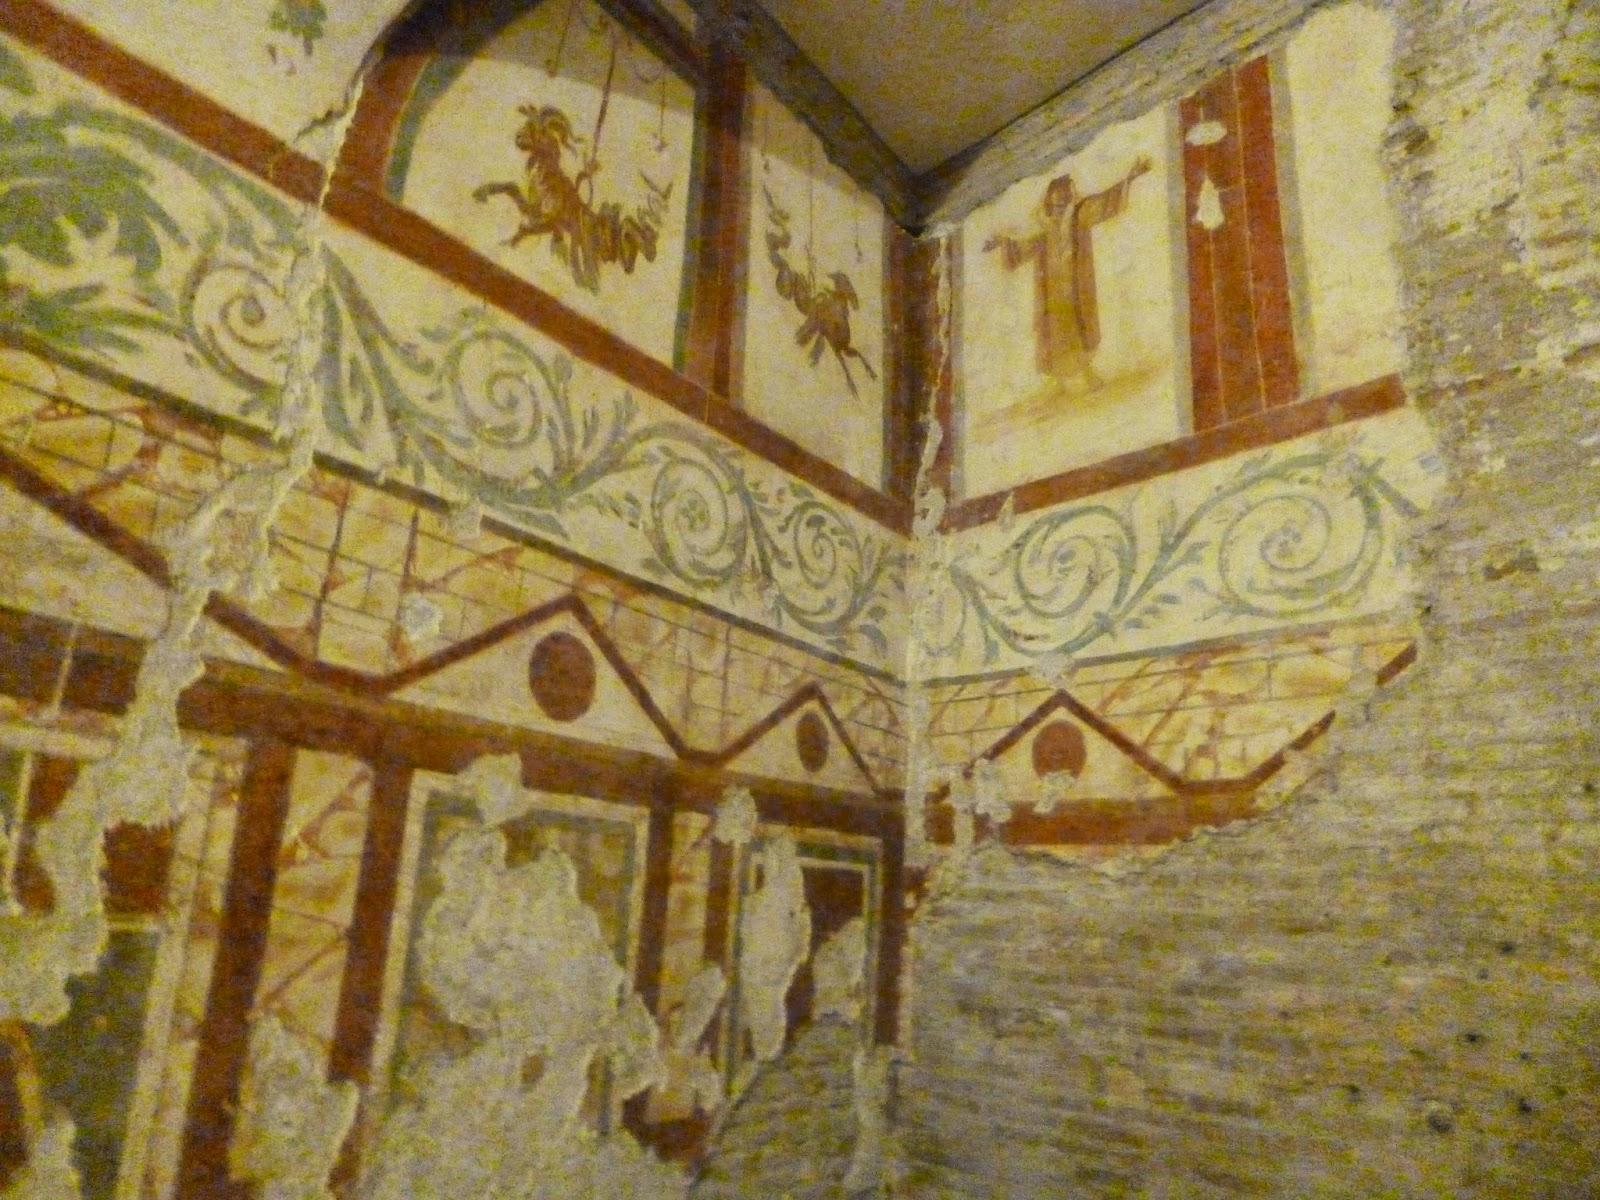 As casas romanas do Célio